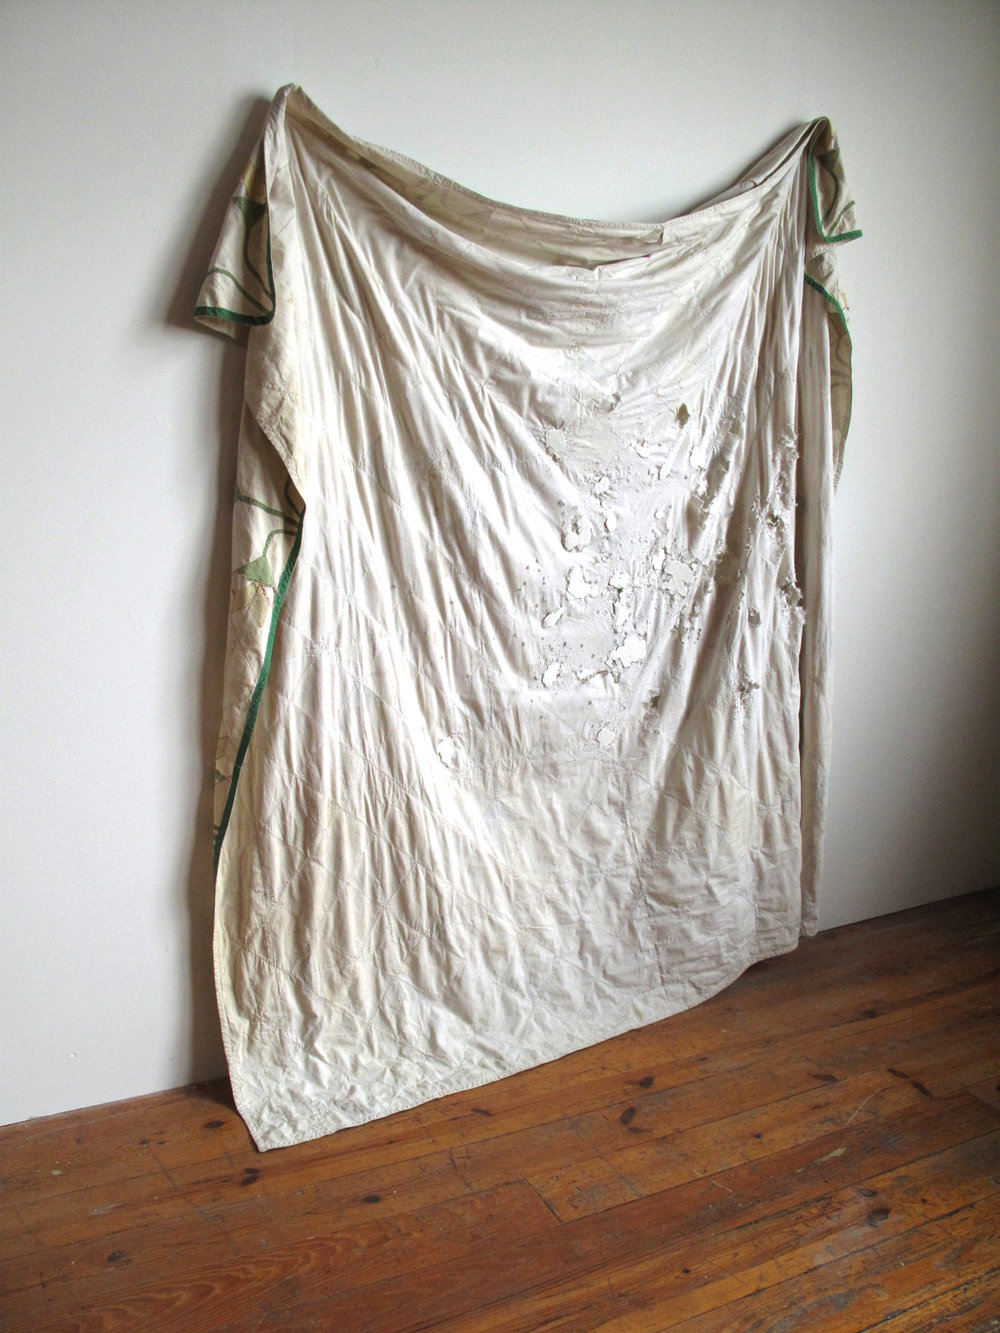 undercoat, 2012, quilt, gunshots, spackling